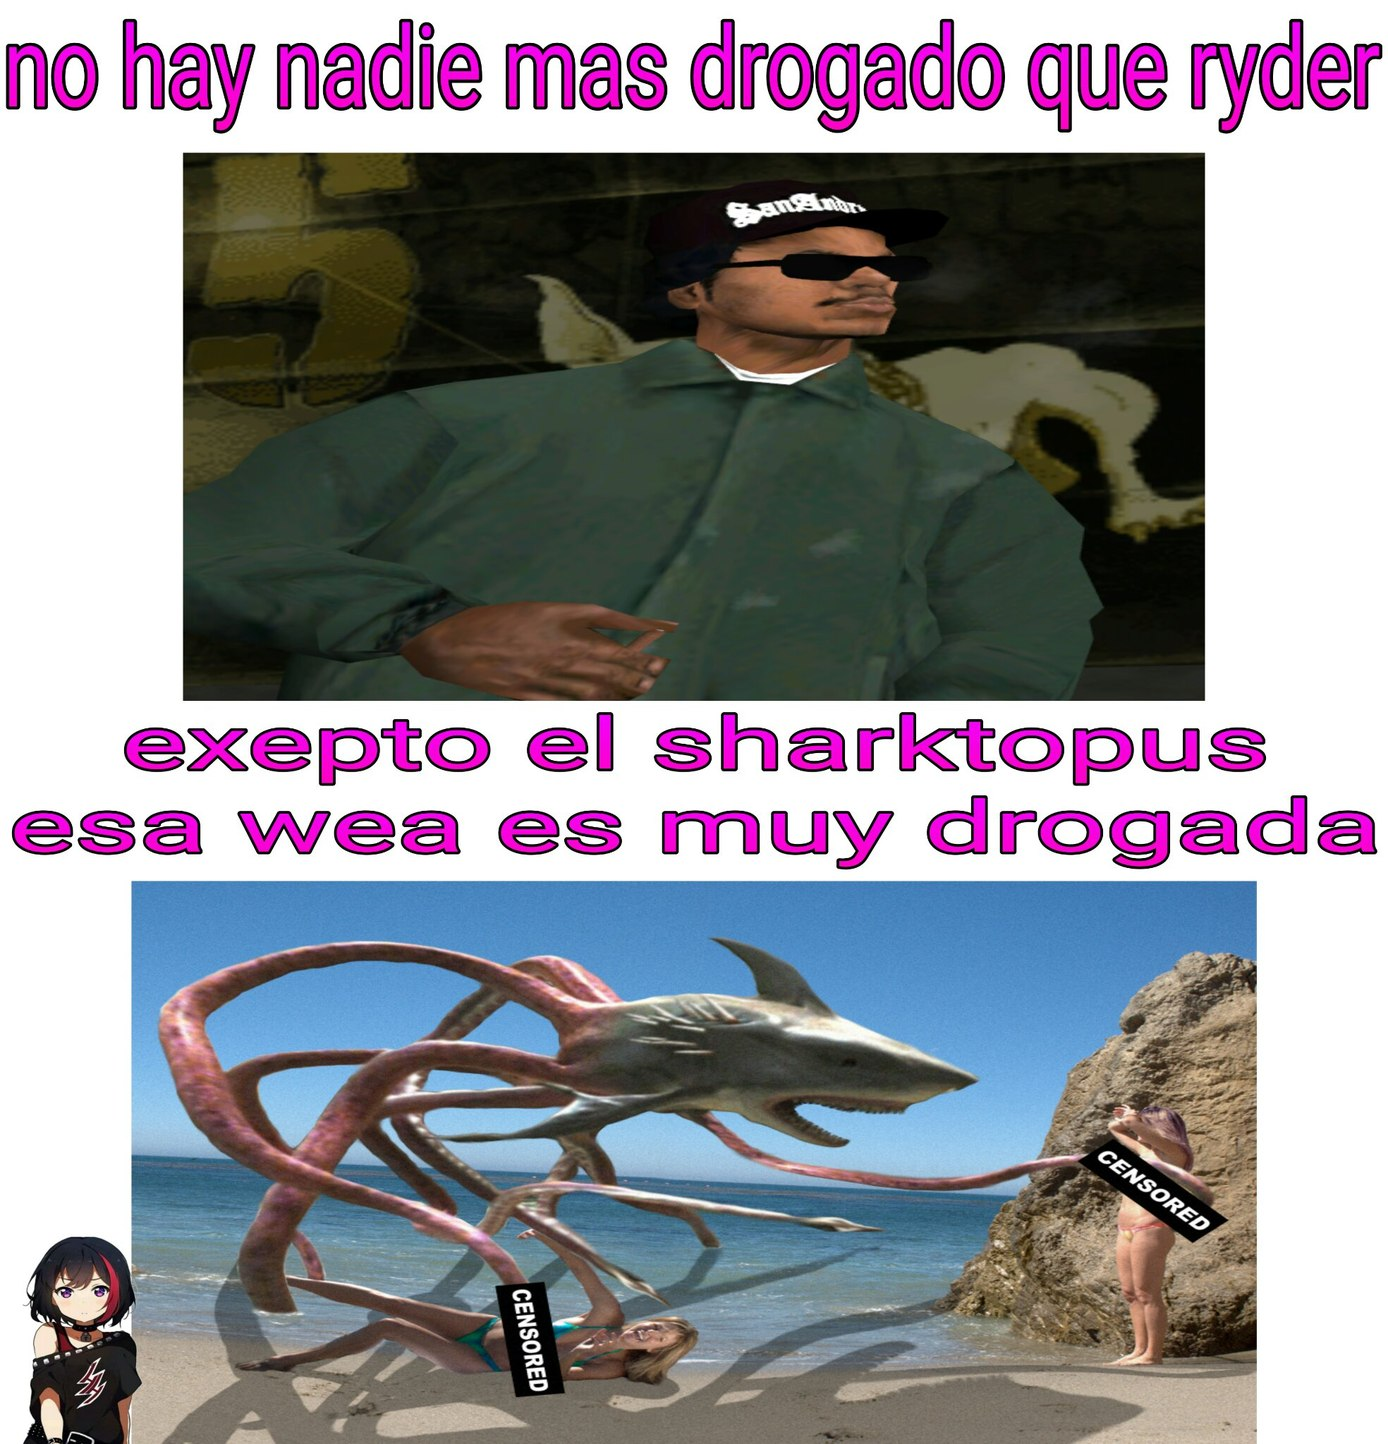 Ahi esta...el tiburon - meme